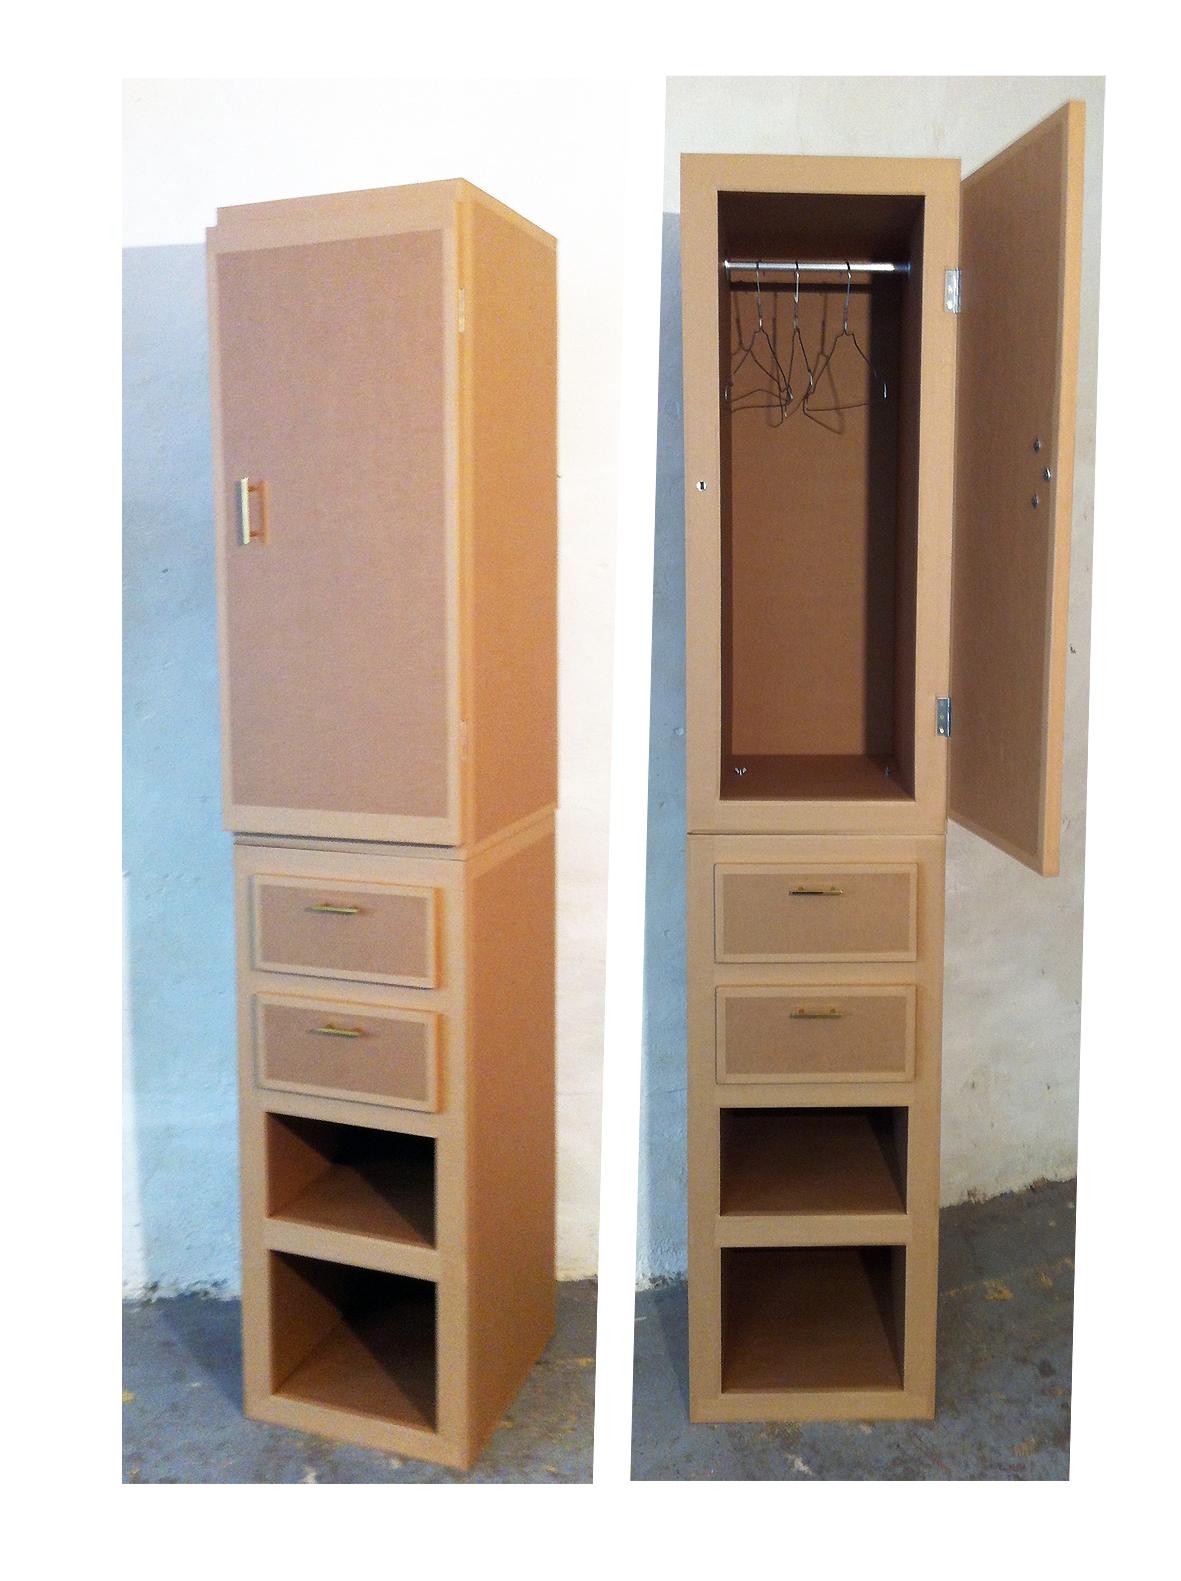 penderie en carton. meuble en carton sur mesure. fabriqué à marseille par juliadesign.